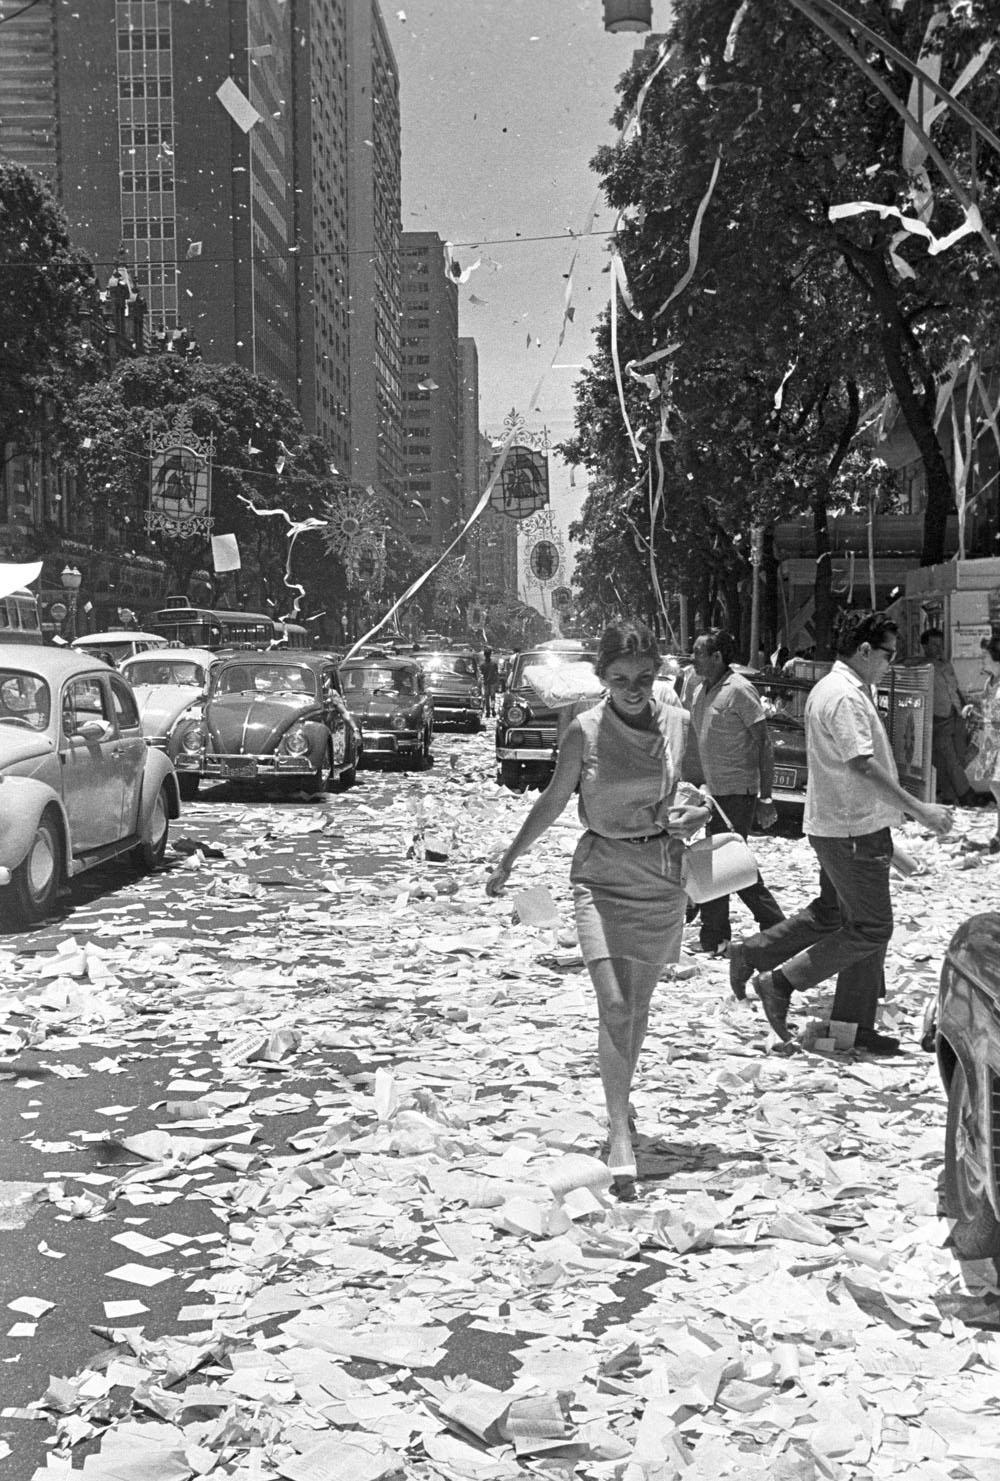 Centro do Rio de Janeiro, último dia do ano no centro do Rio RIO-ANTIGO-13